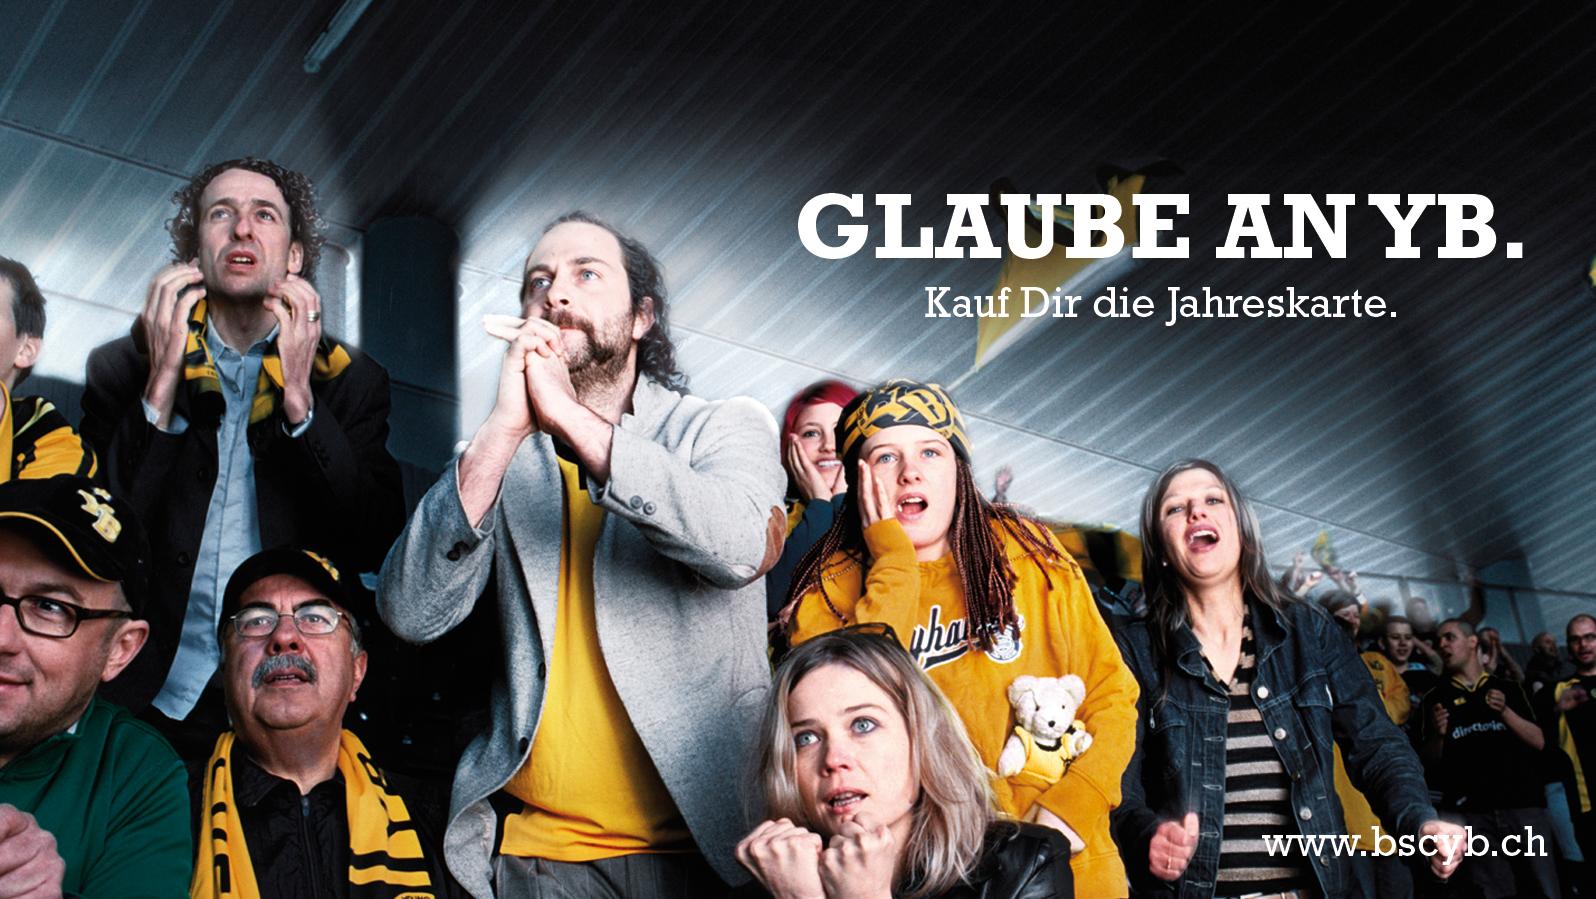 Glaube an YB Kampagne (Freelancing für Freiburghaus & Partner AG Bern)